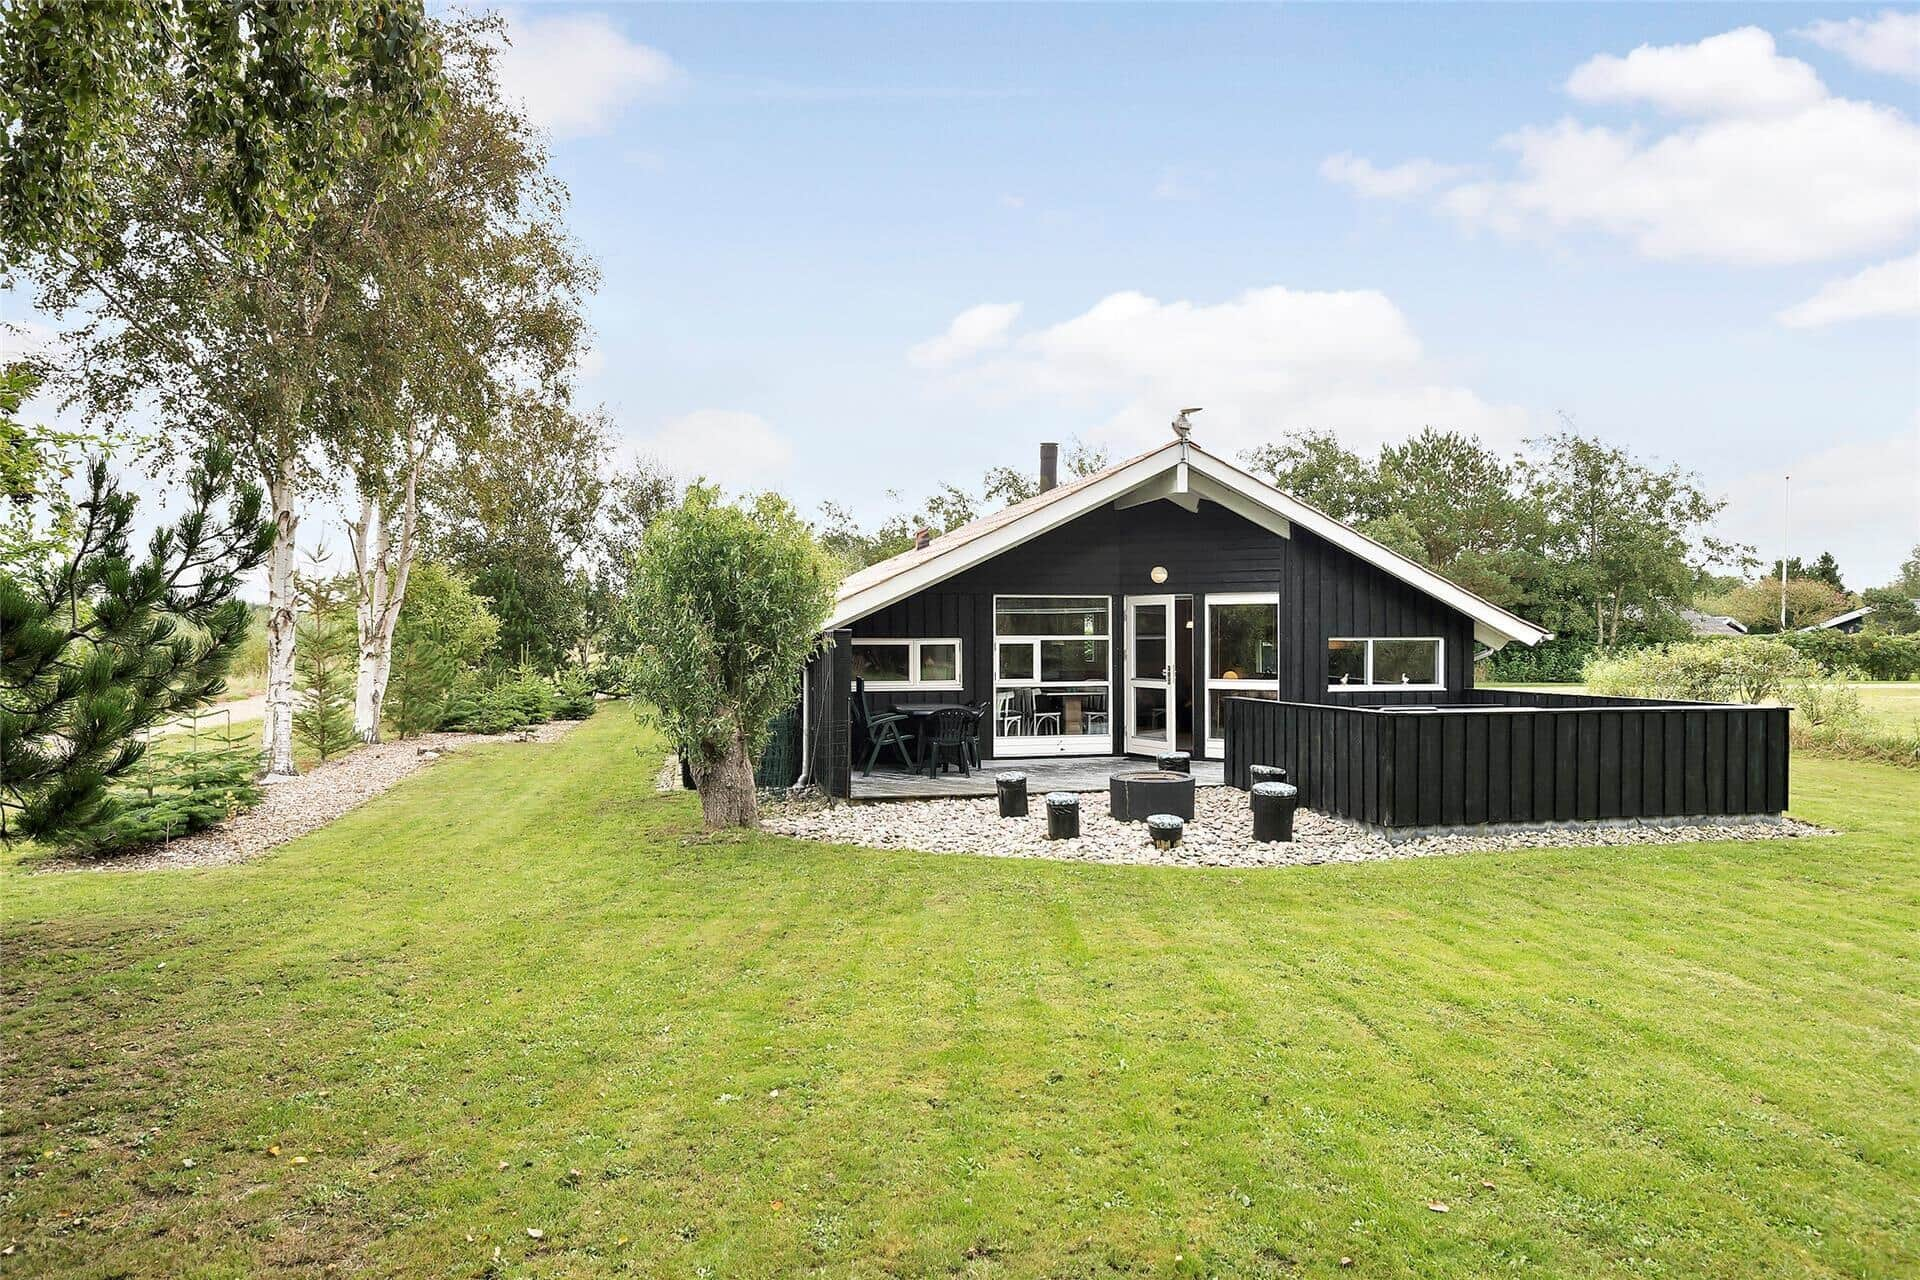 Bild 1-22 Ferienhaus C11029, Horsfold 166, DK - 6893 Hemmet